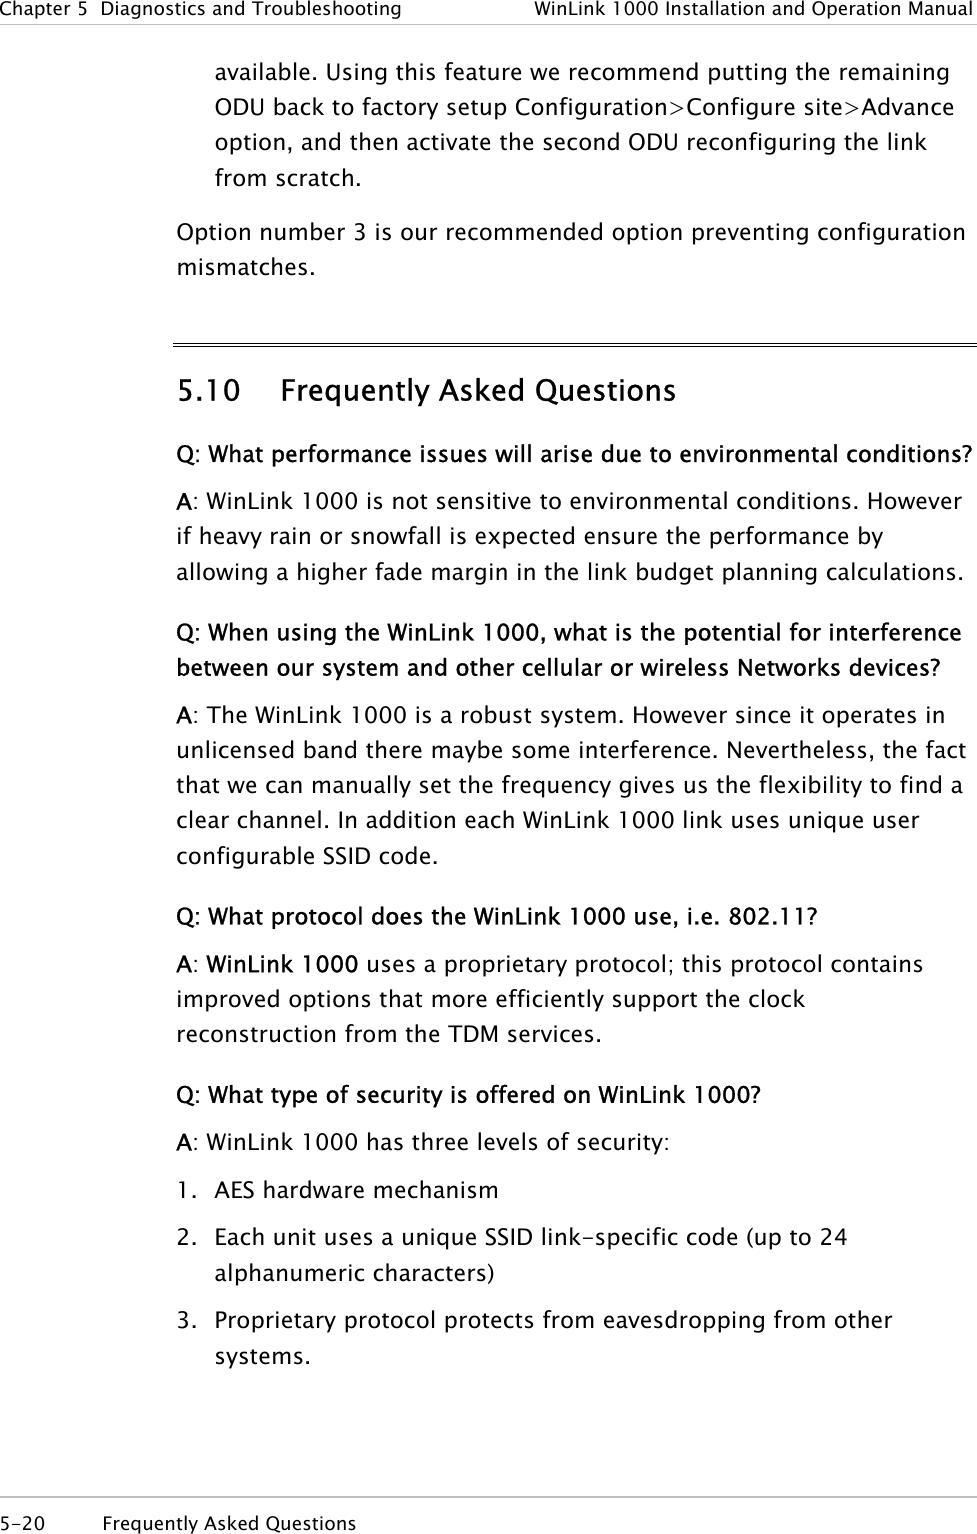 Radwin AMWL1250 ODU Transmitter User Manual Part 2